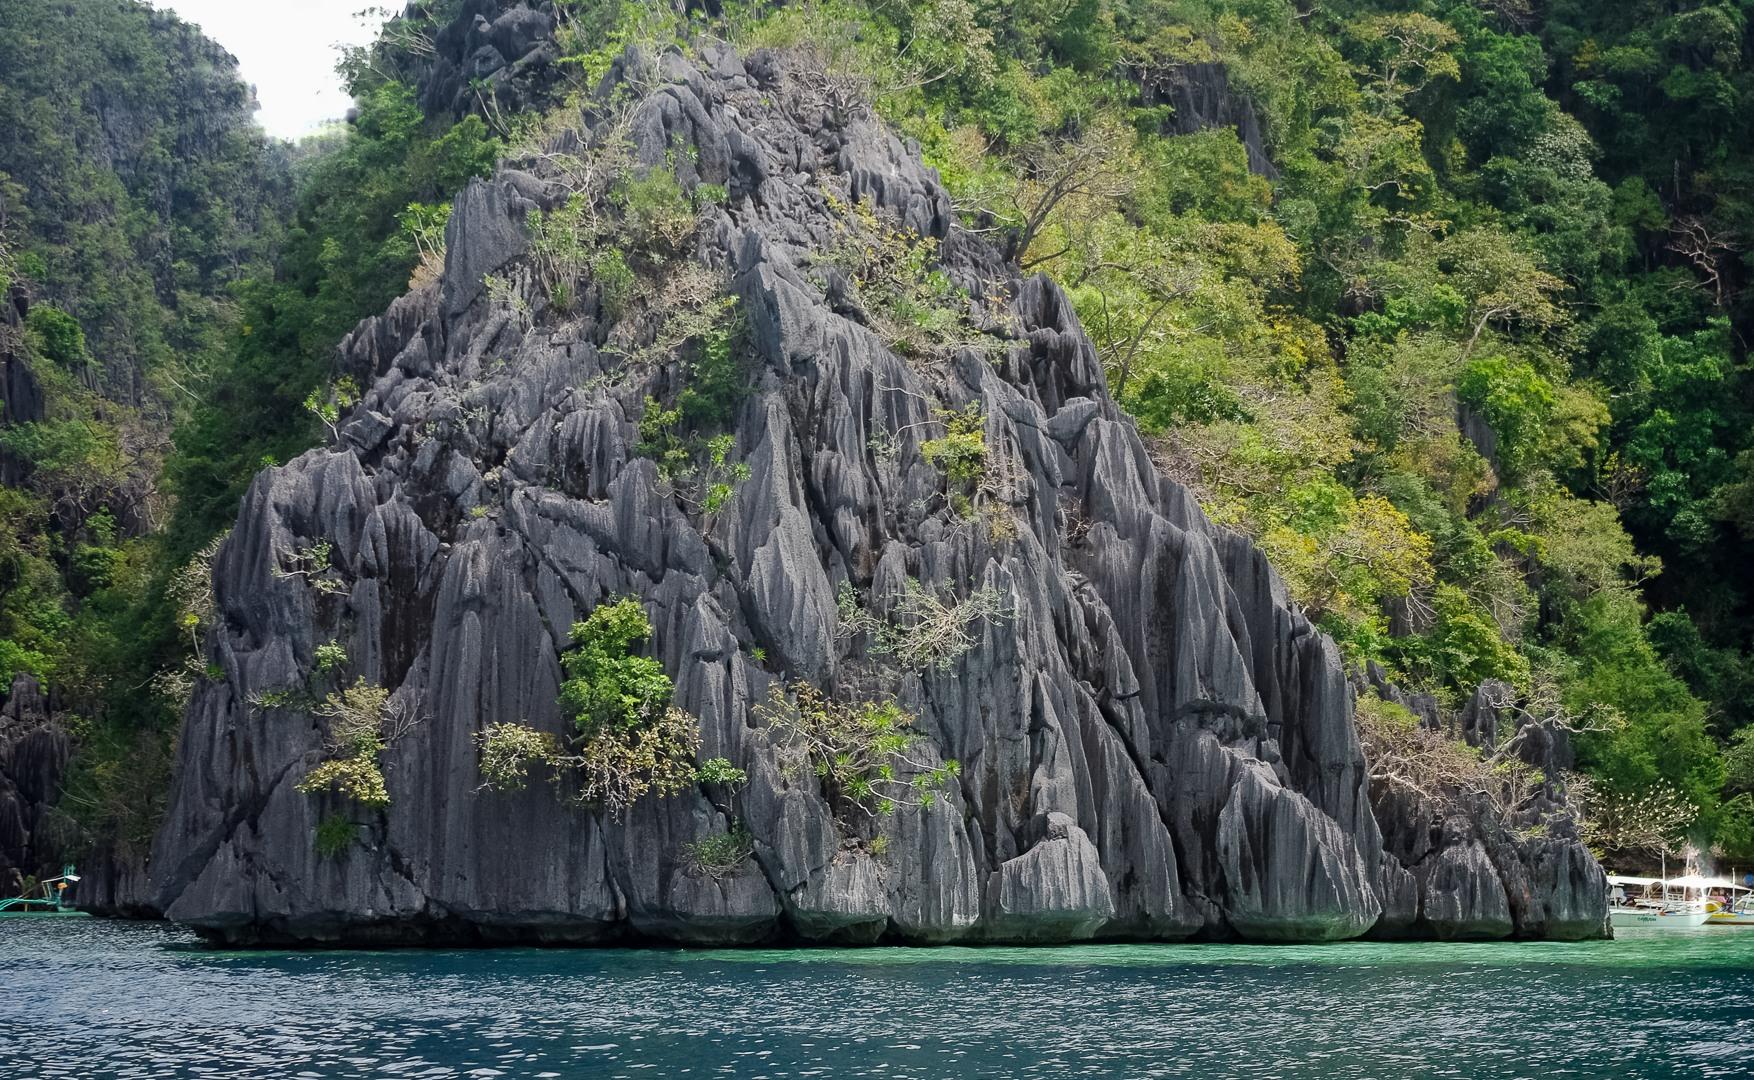 Island near Lake Barracuda, Philippines